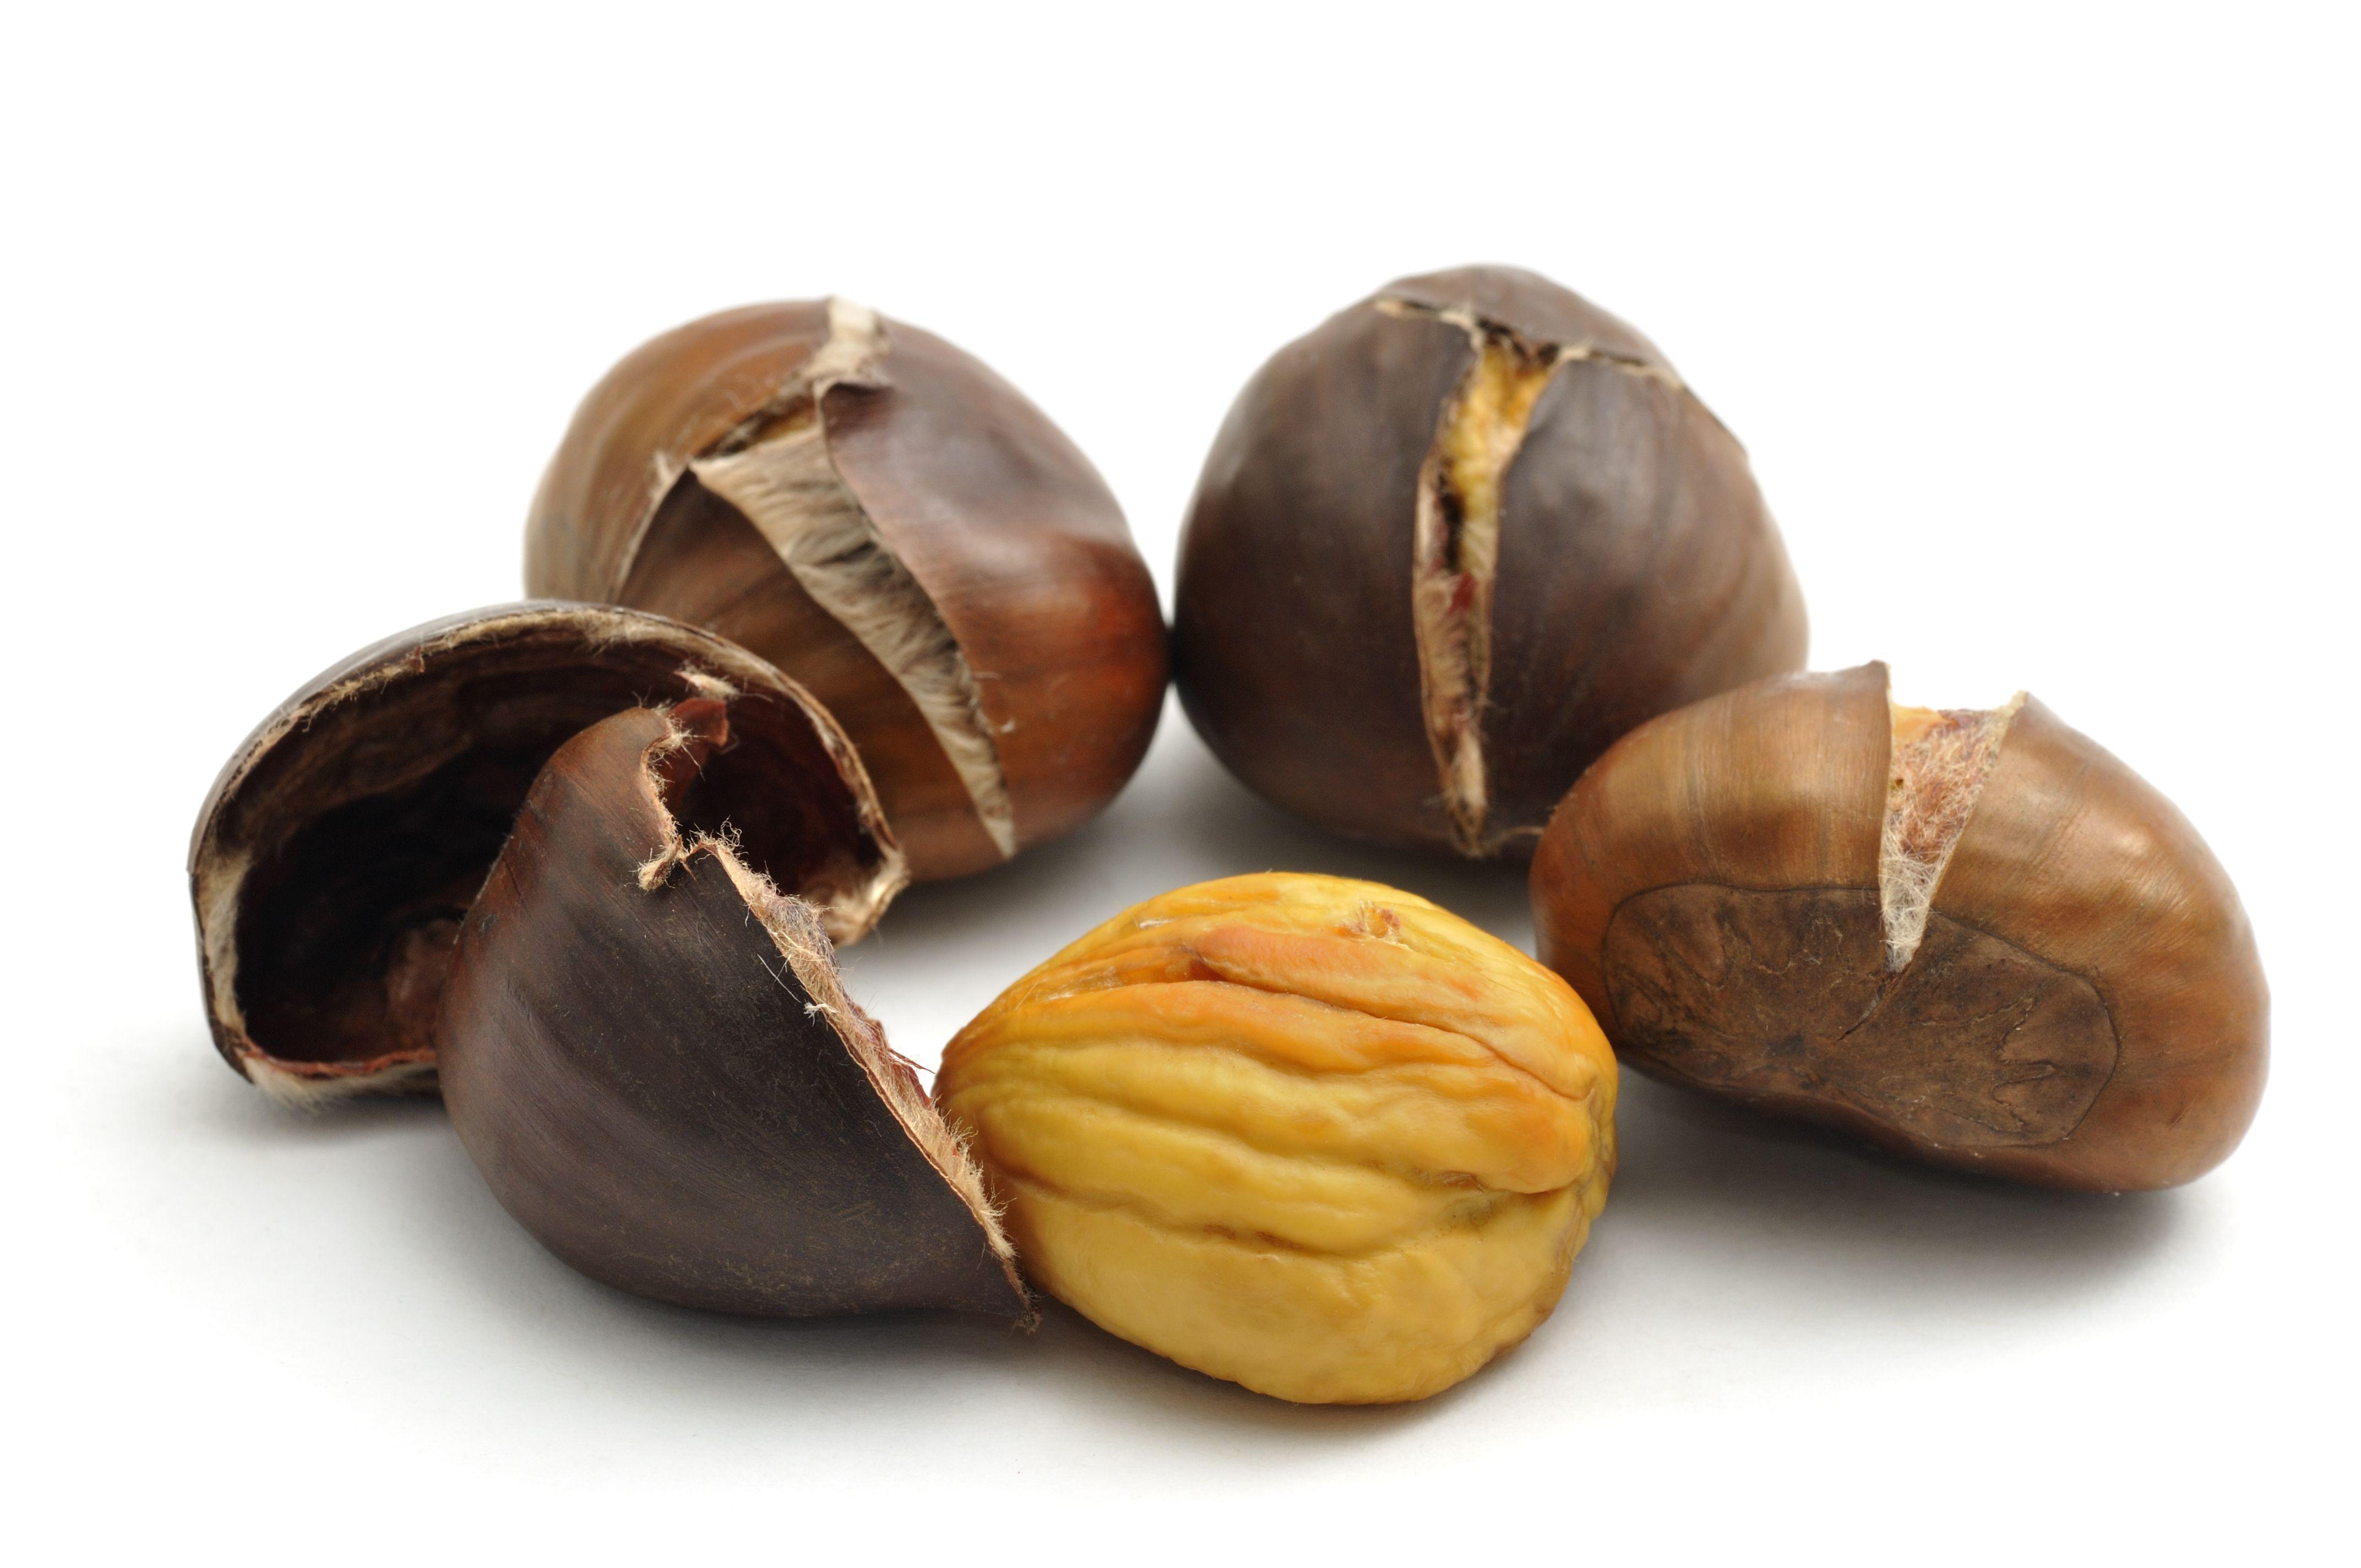 2 Easy Ways To Peel Chestnuts